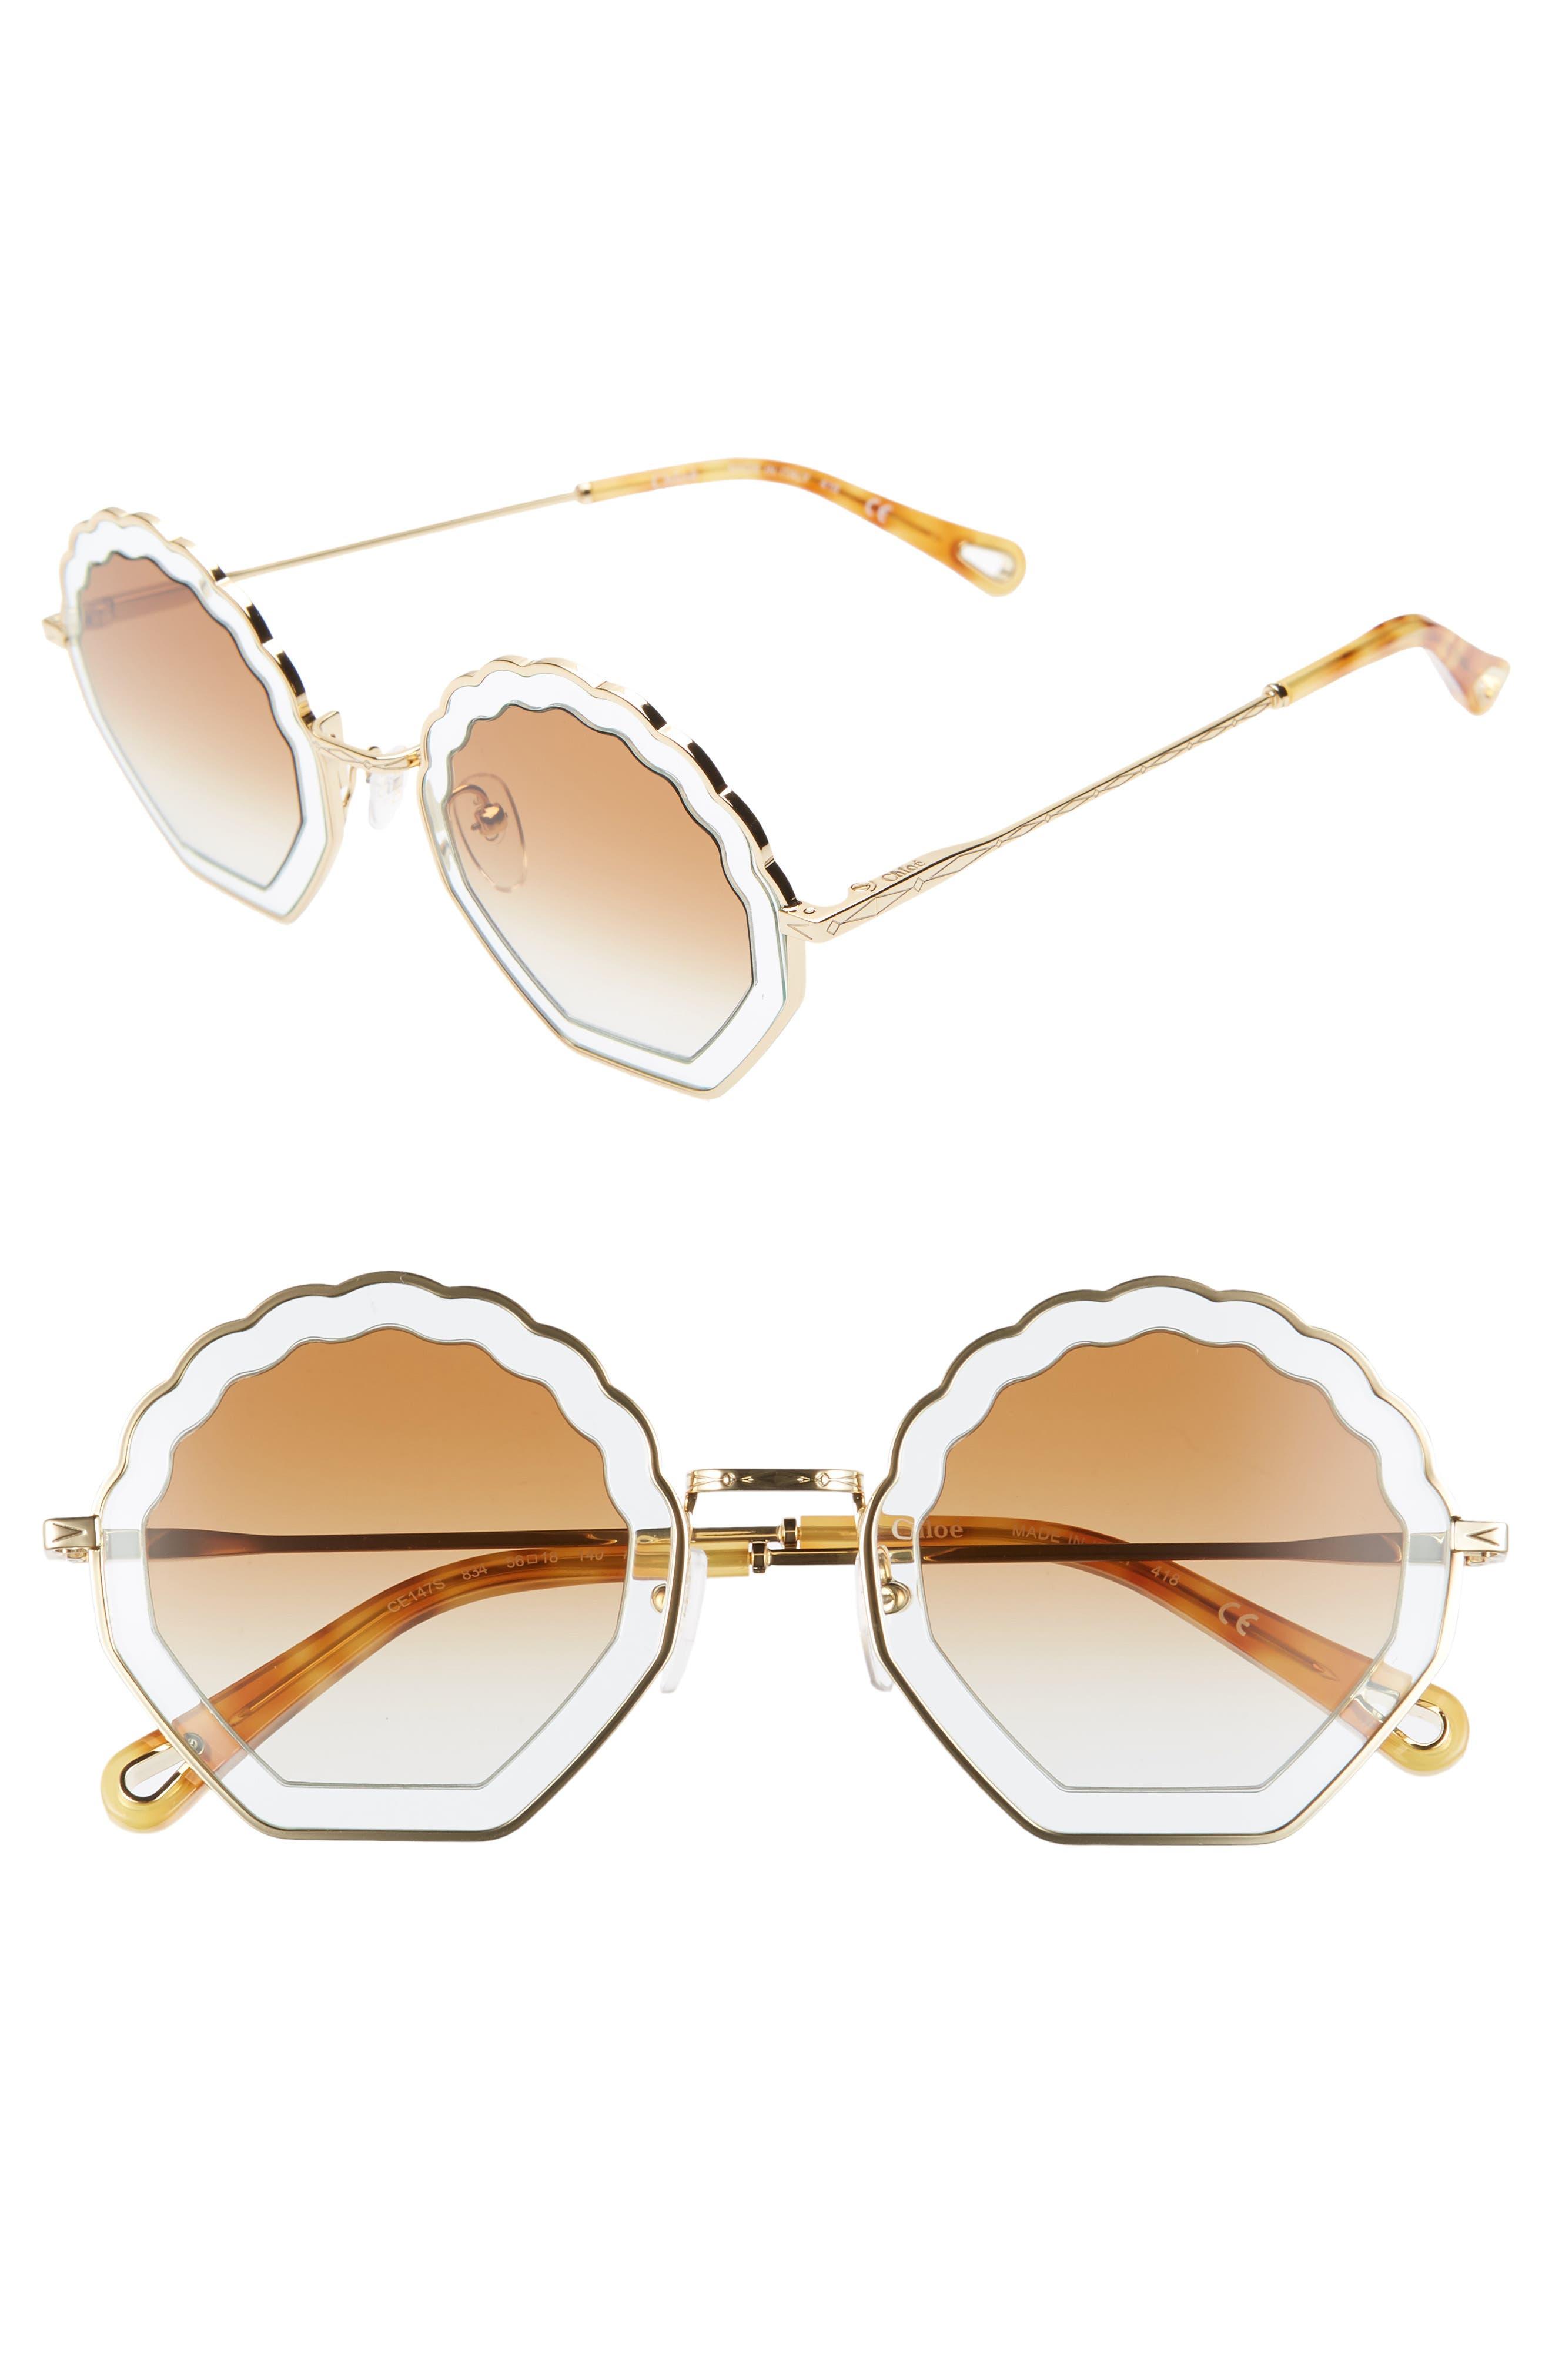 Chloe Tally 5m Scalloped Sunglasses - Gold/ Azure/ Gradient Burnt